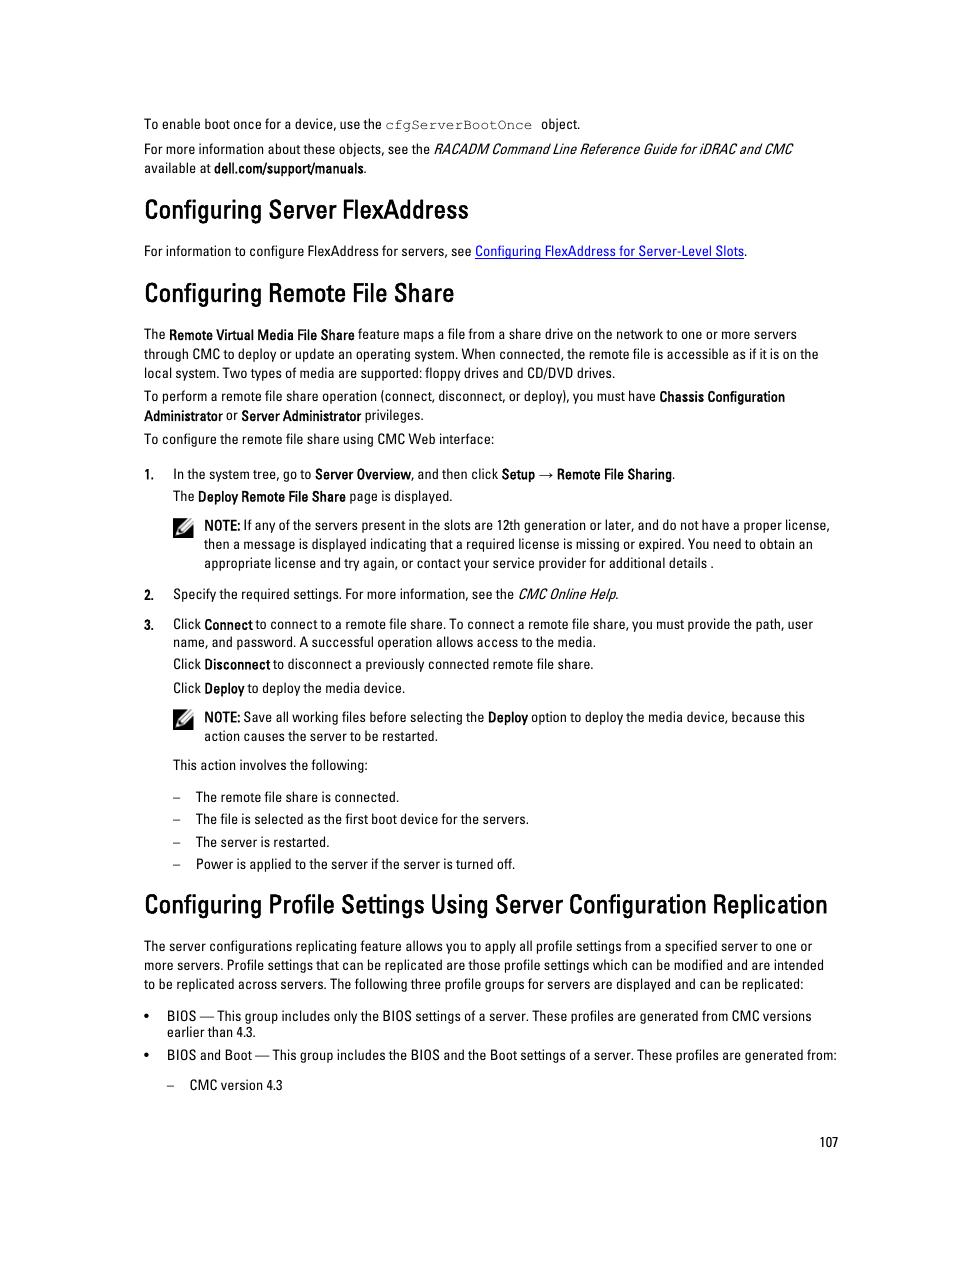 Configuring server flexaddress, Configuring remote file share